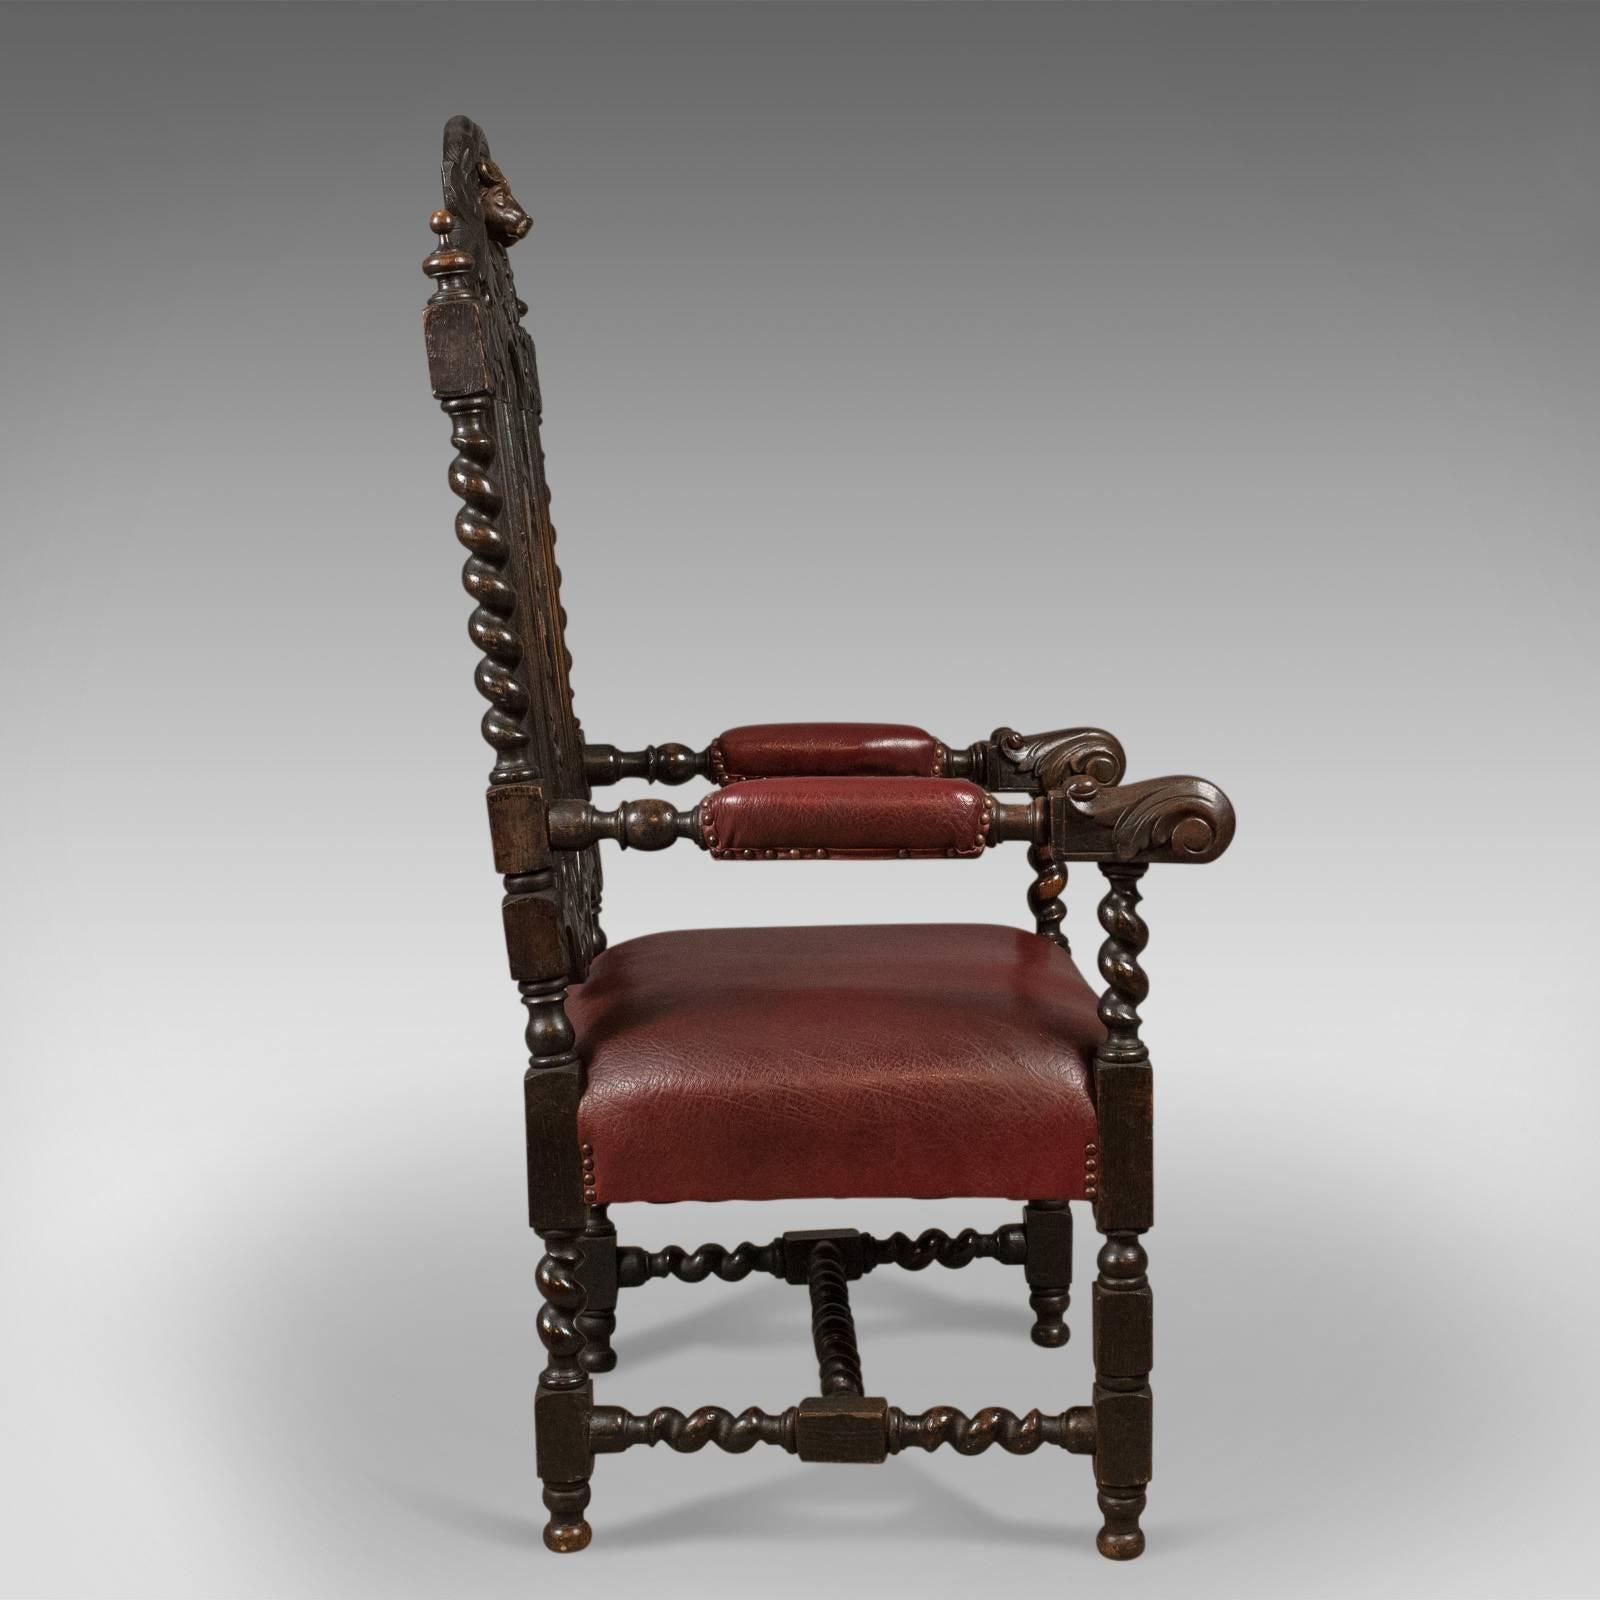 Ordinaire Gothic Revival Antique Lodge Chair, 1913 For Sale